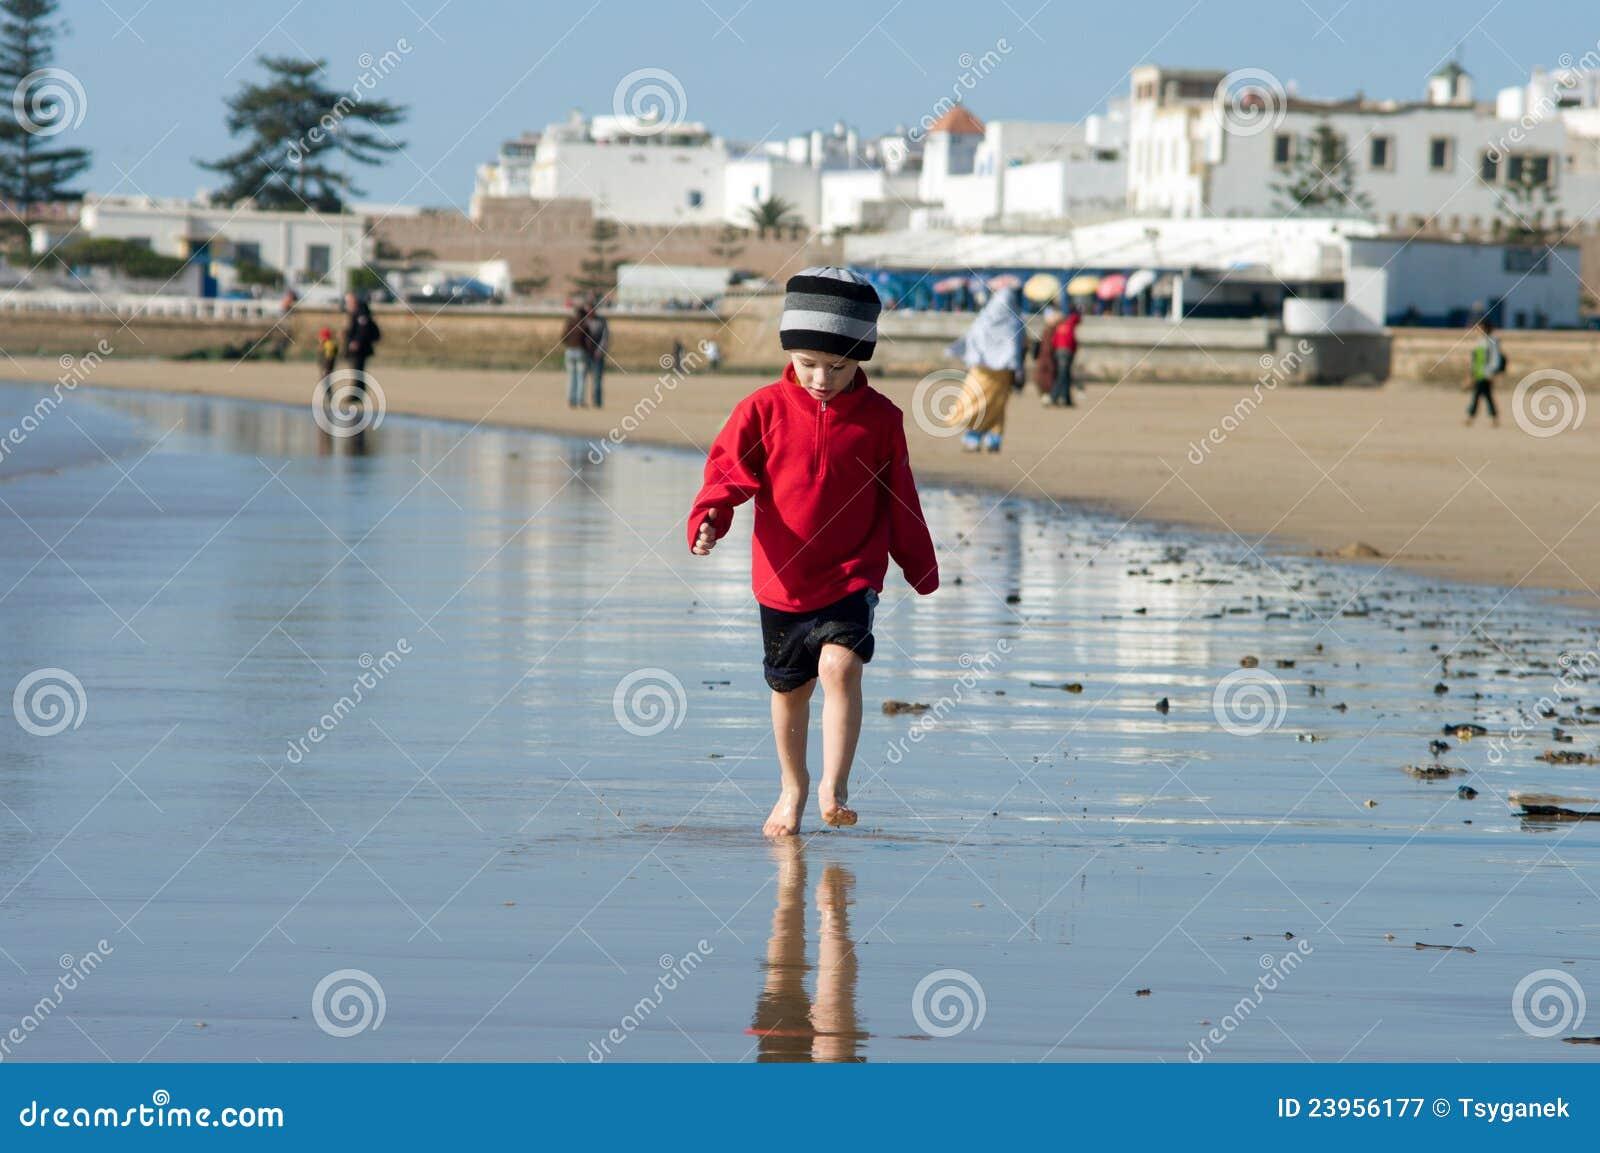 A boy walks on the ocean shore in Morocco